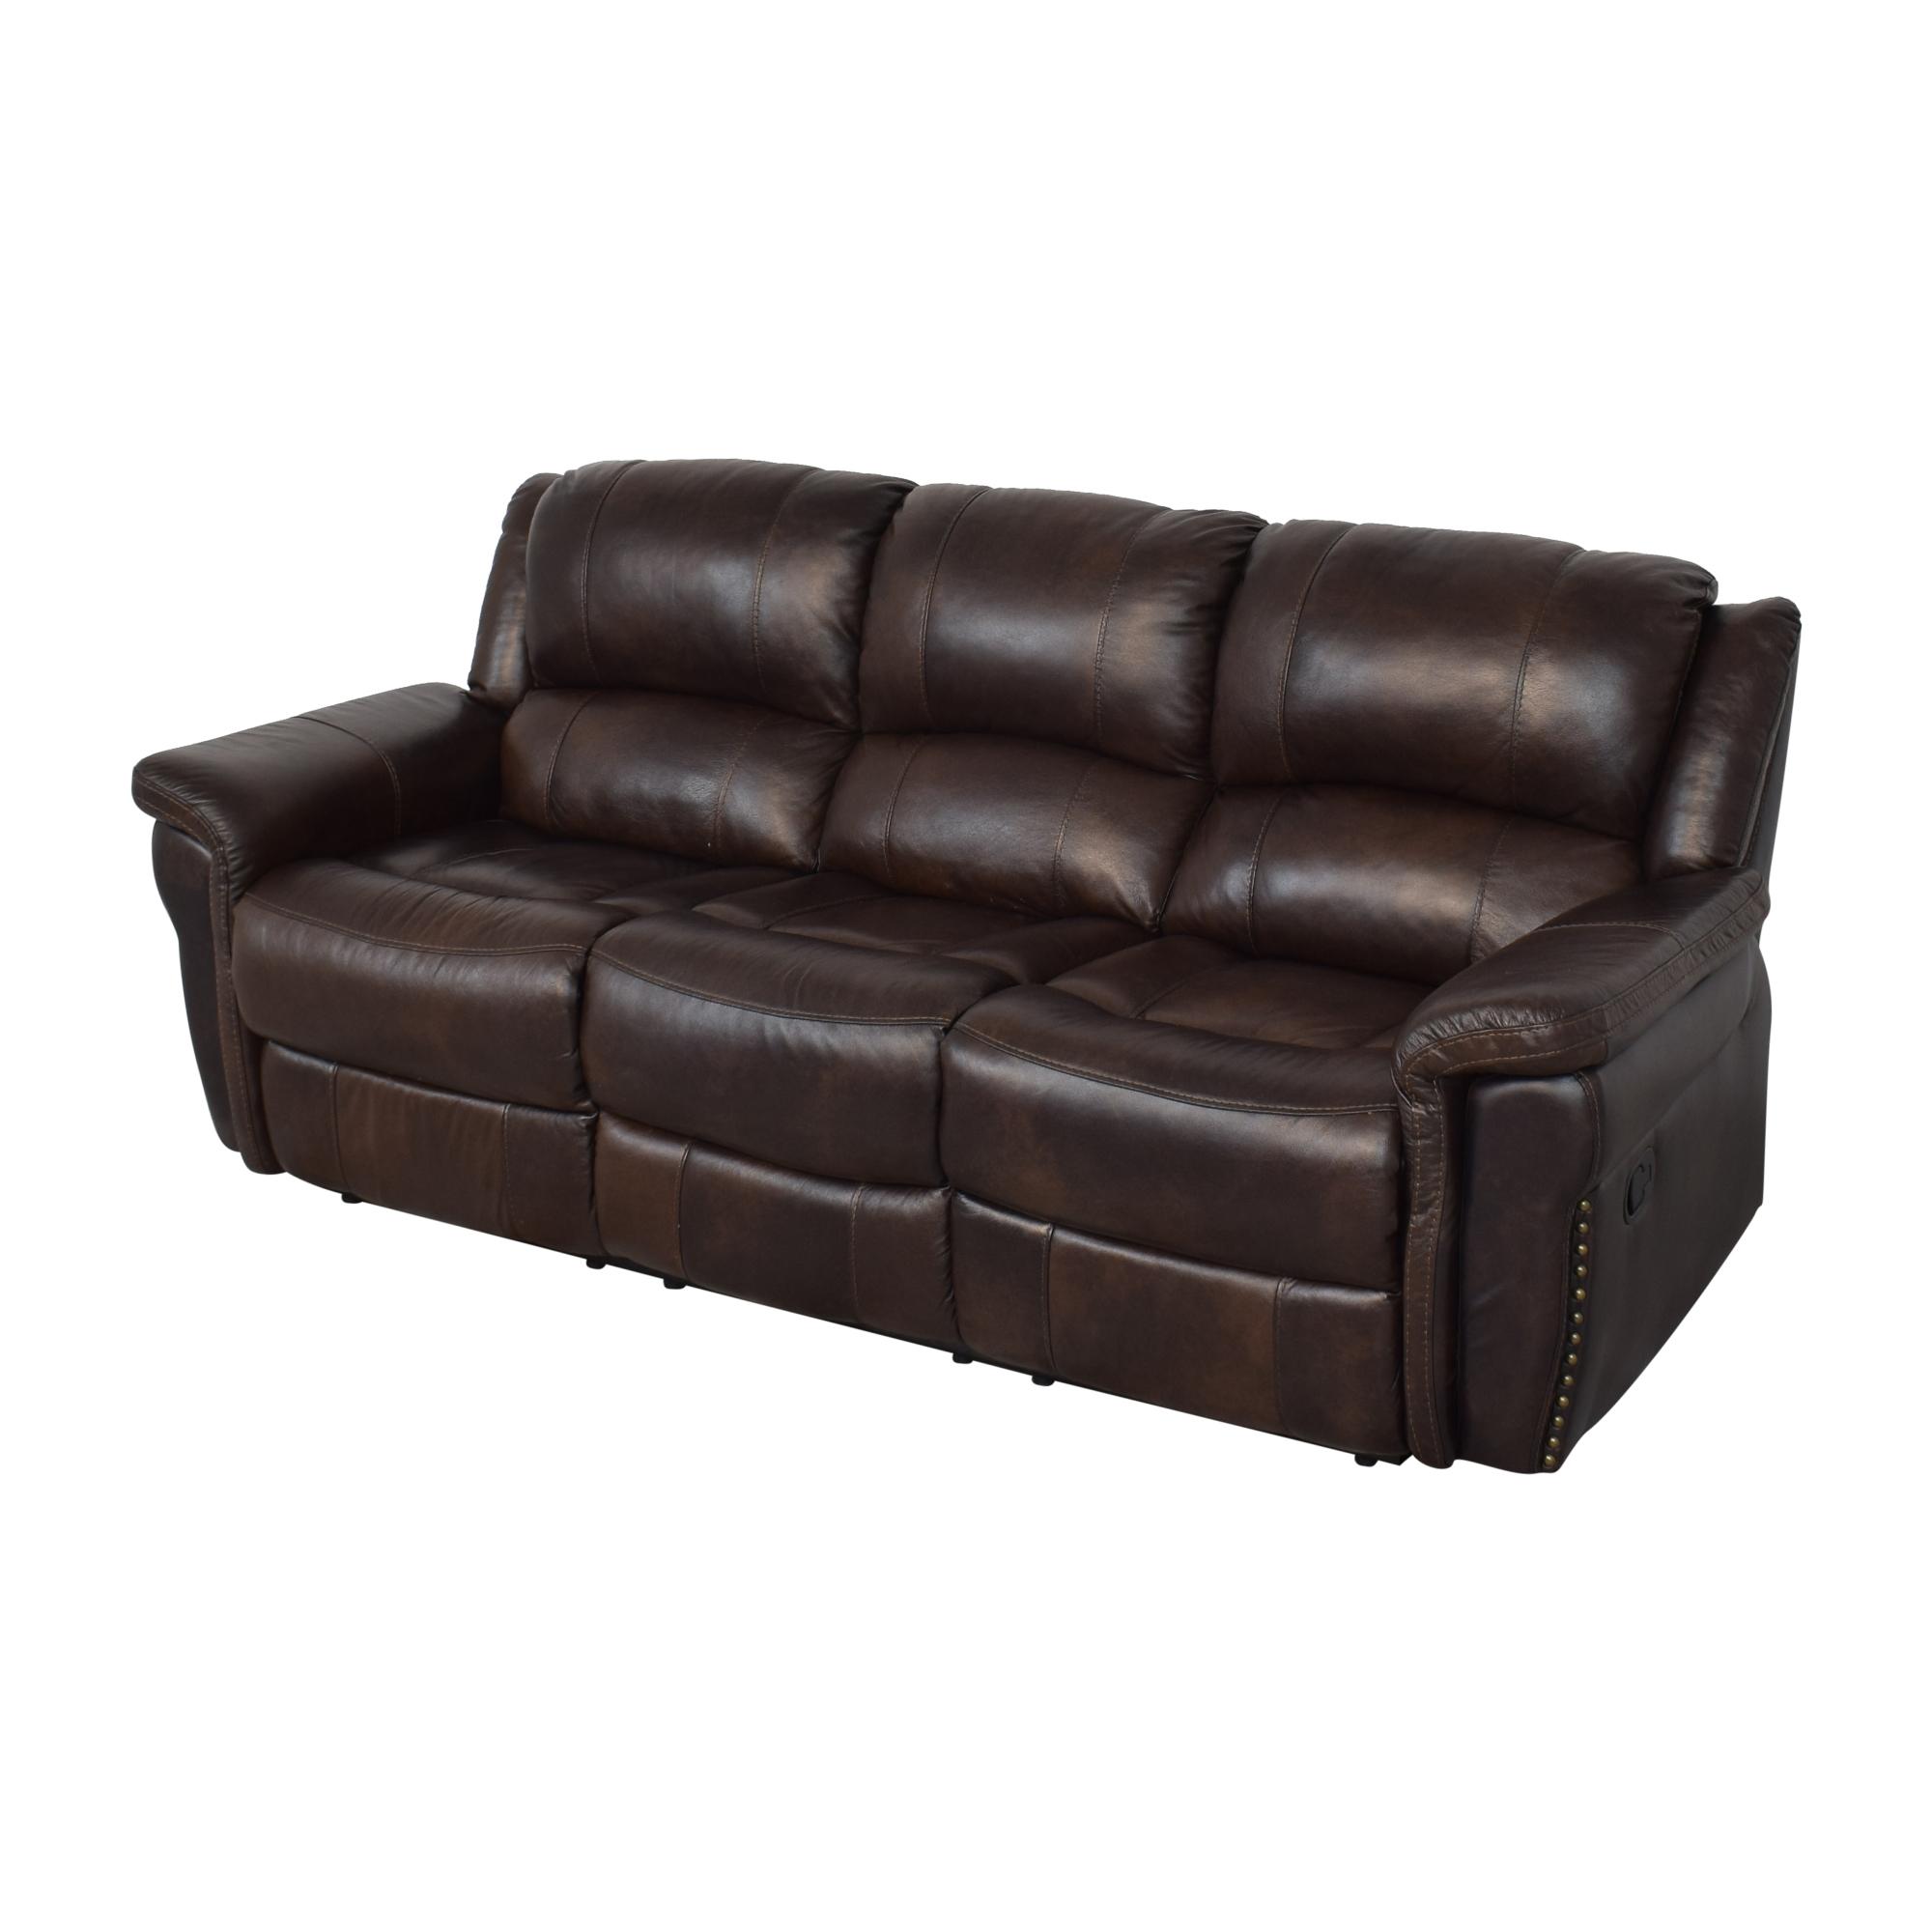 Delancey Street Furniture Recliner Sofa on sale